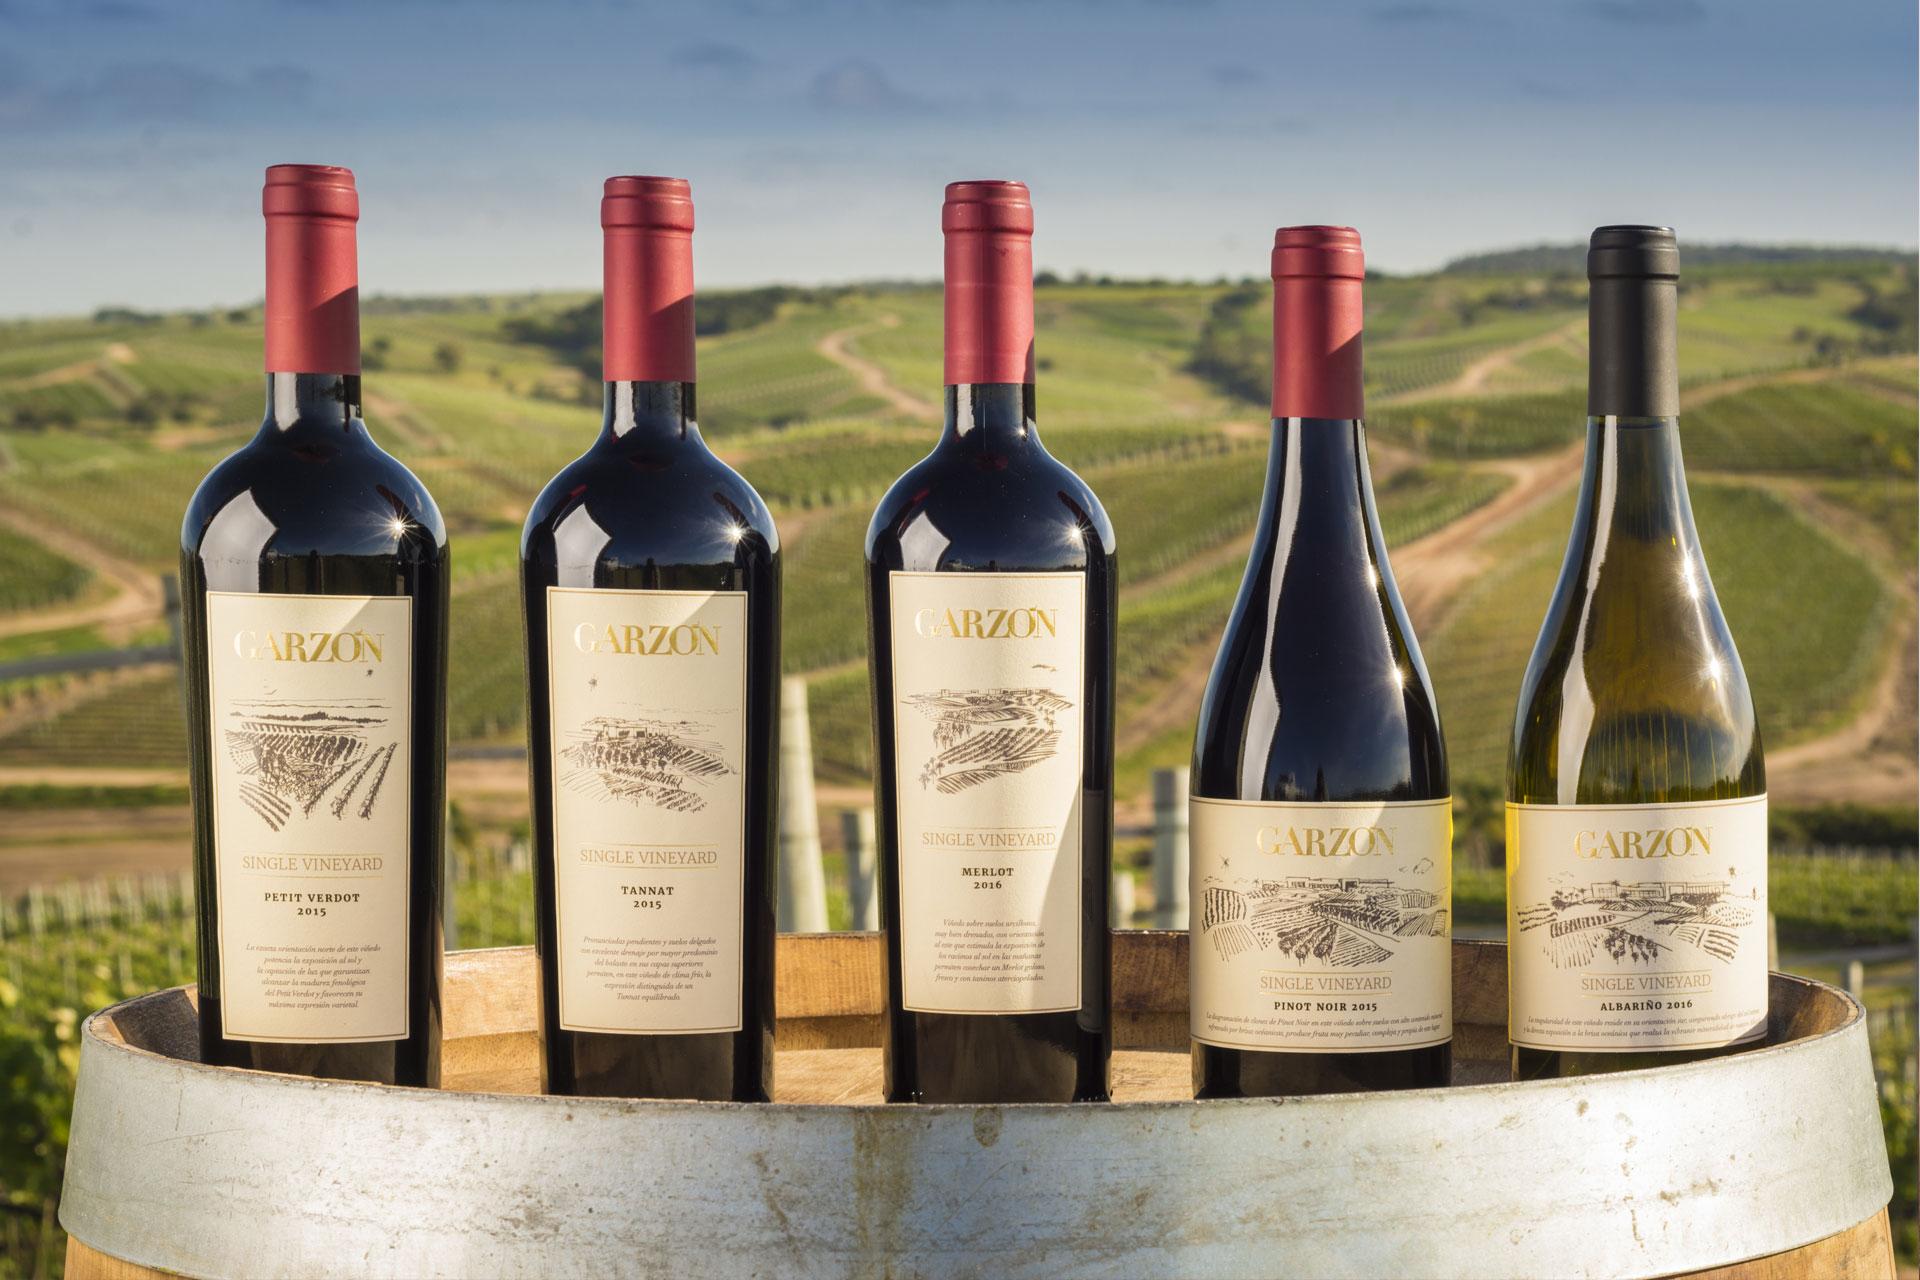 garzon albarino single vineyard